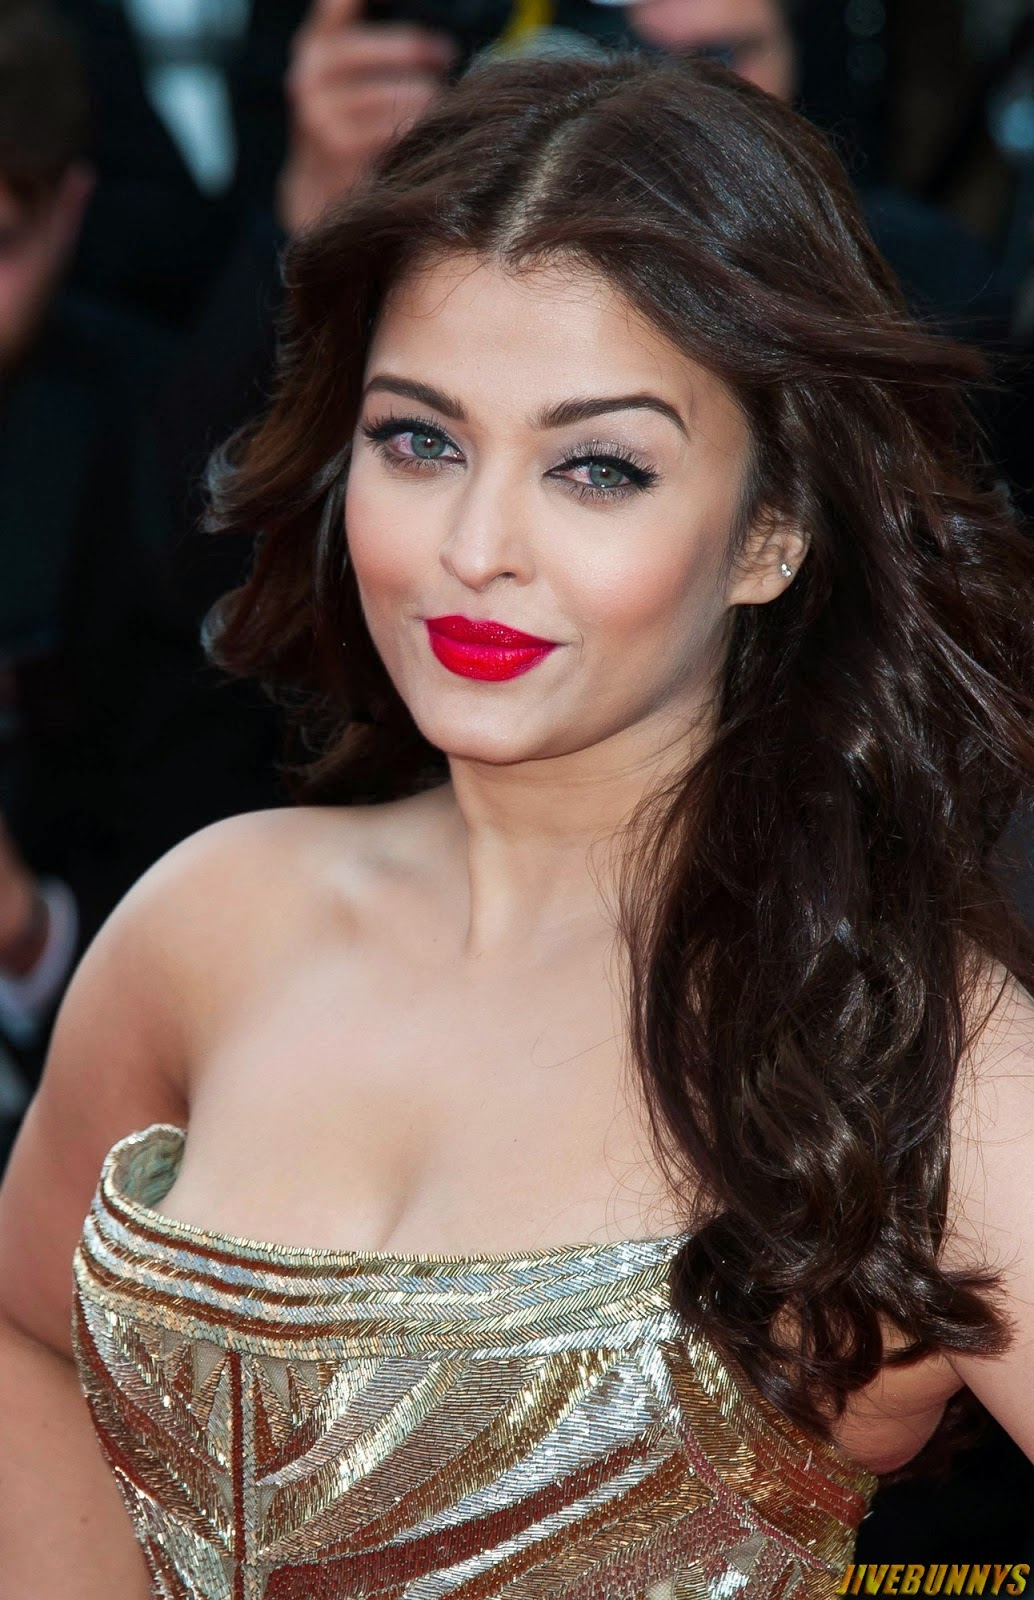 Aishwarya Rai Latest New Look Hd Hot And Sexy Photo Gallery-6130